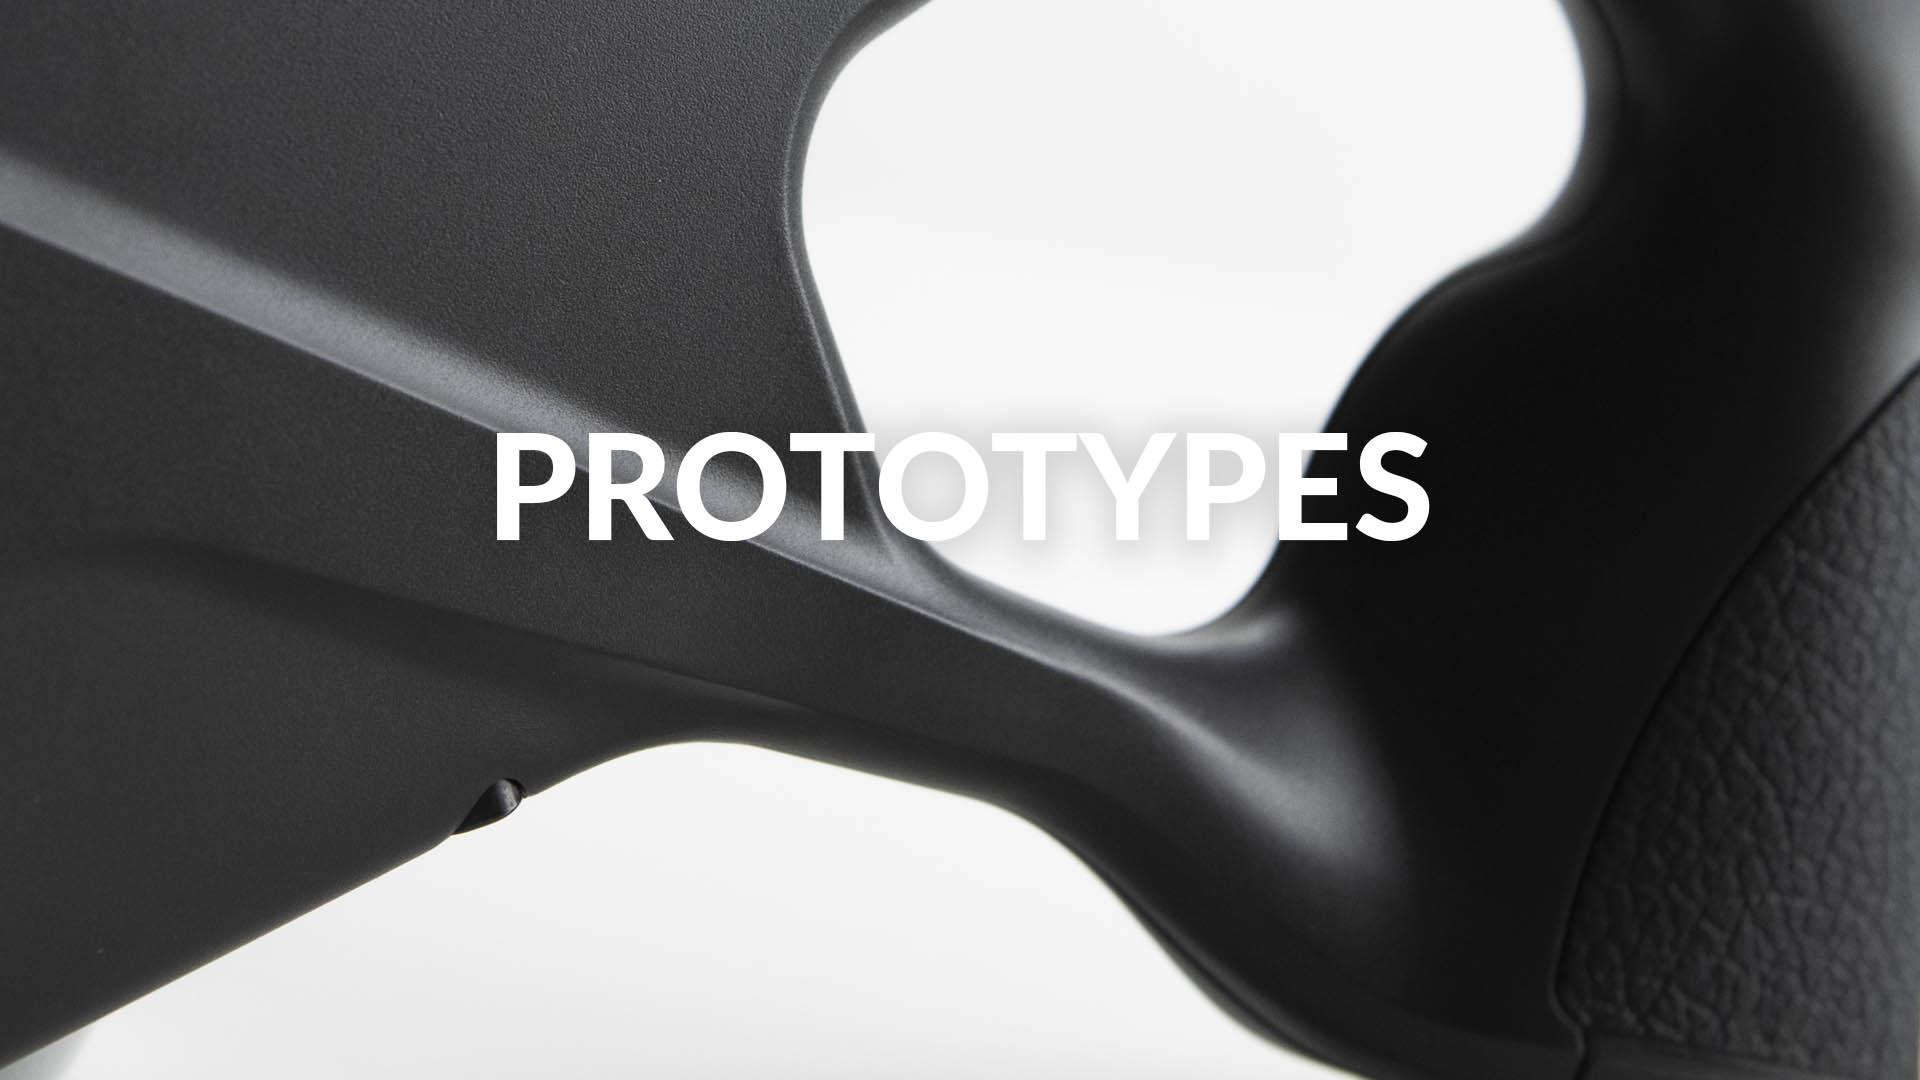 Pdat - Prototypes